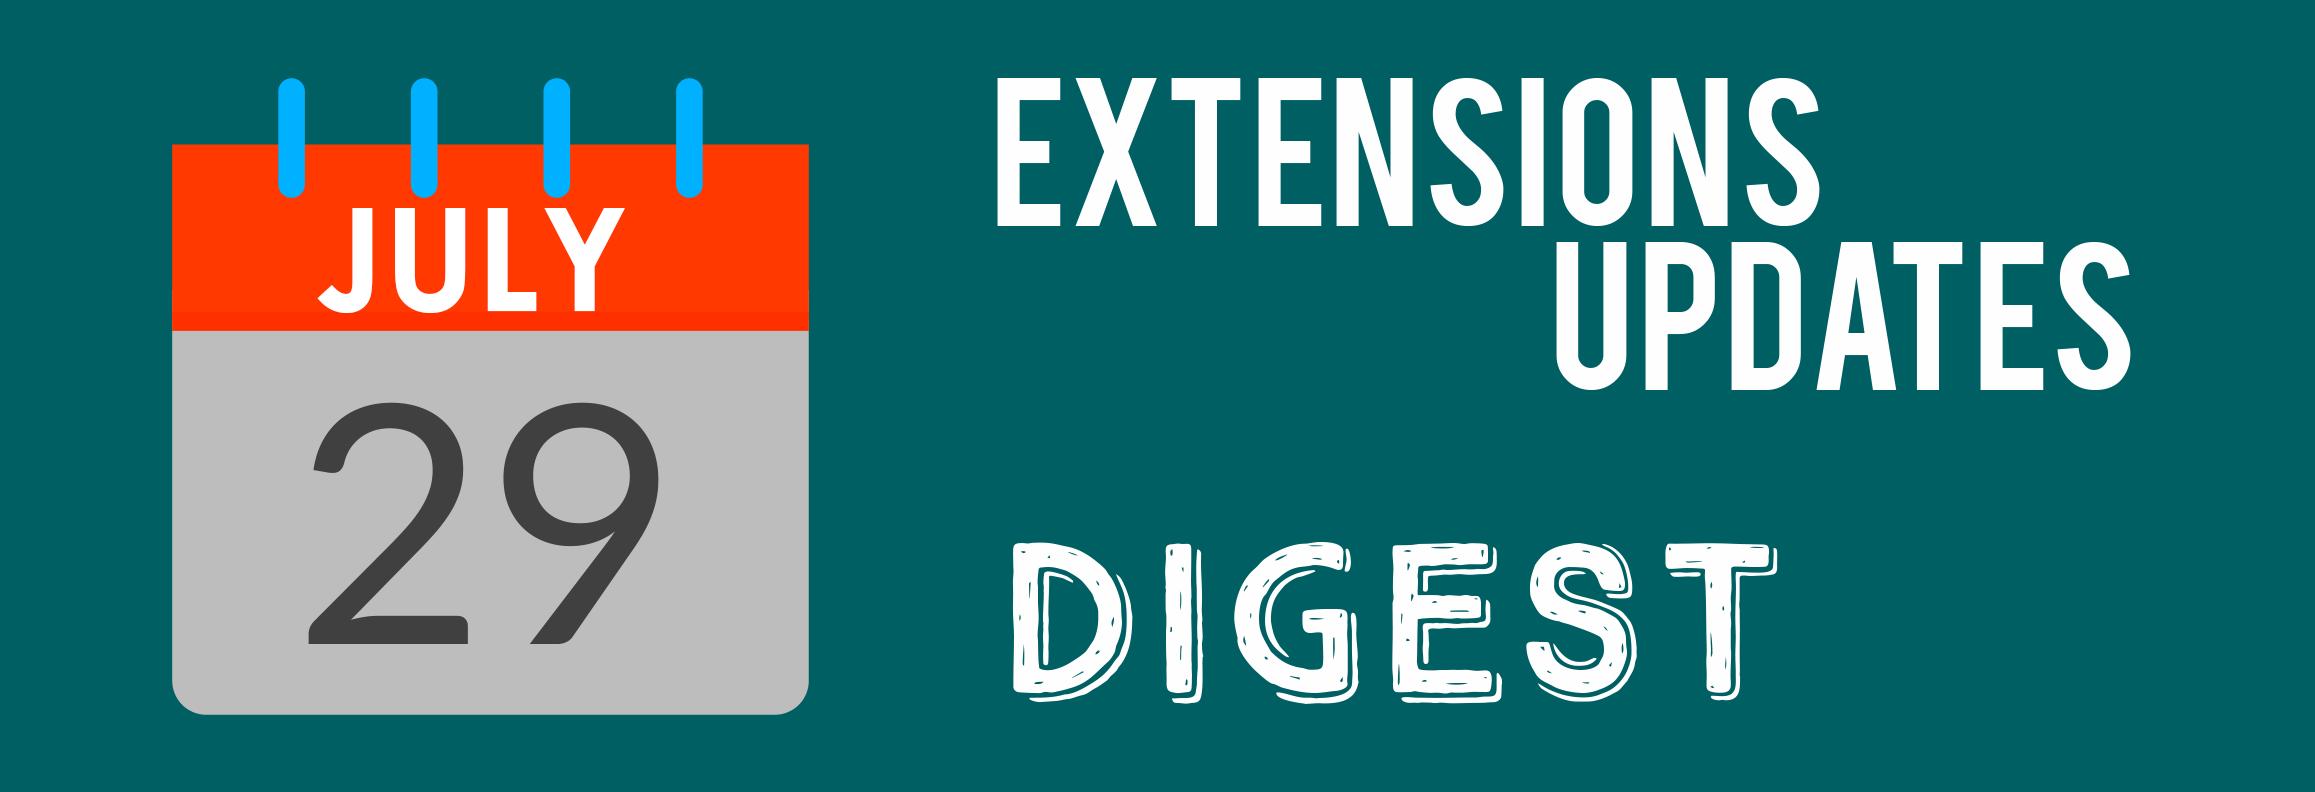 Mirasvit Extensions Update Digest July